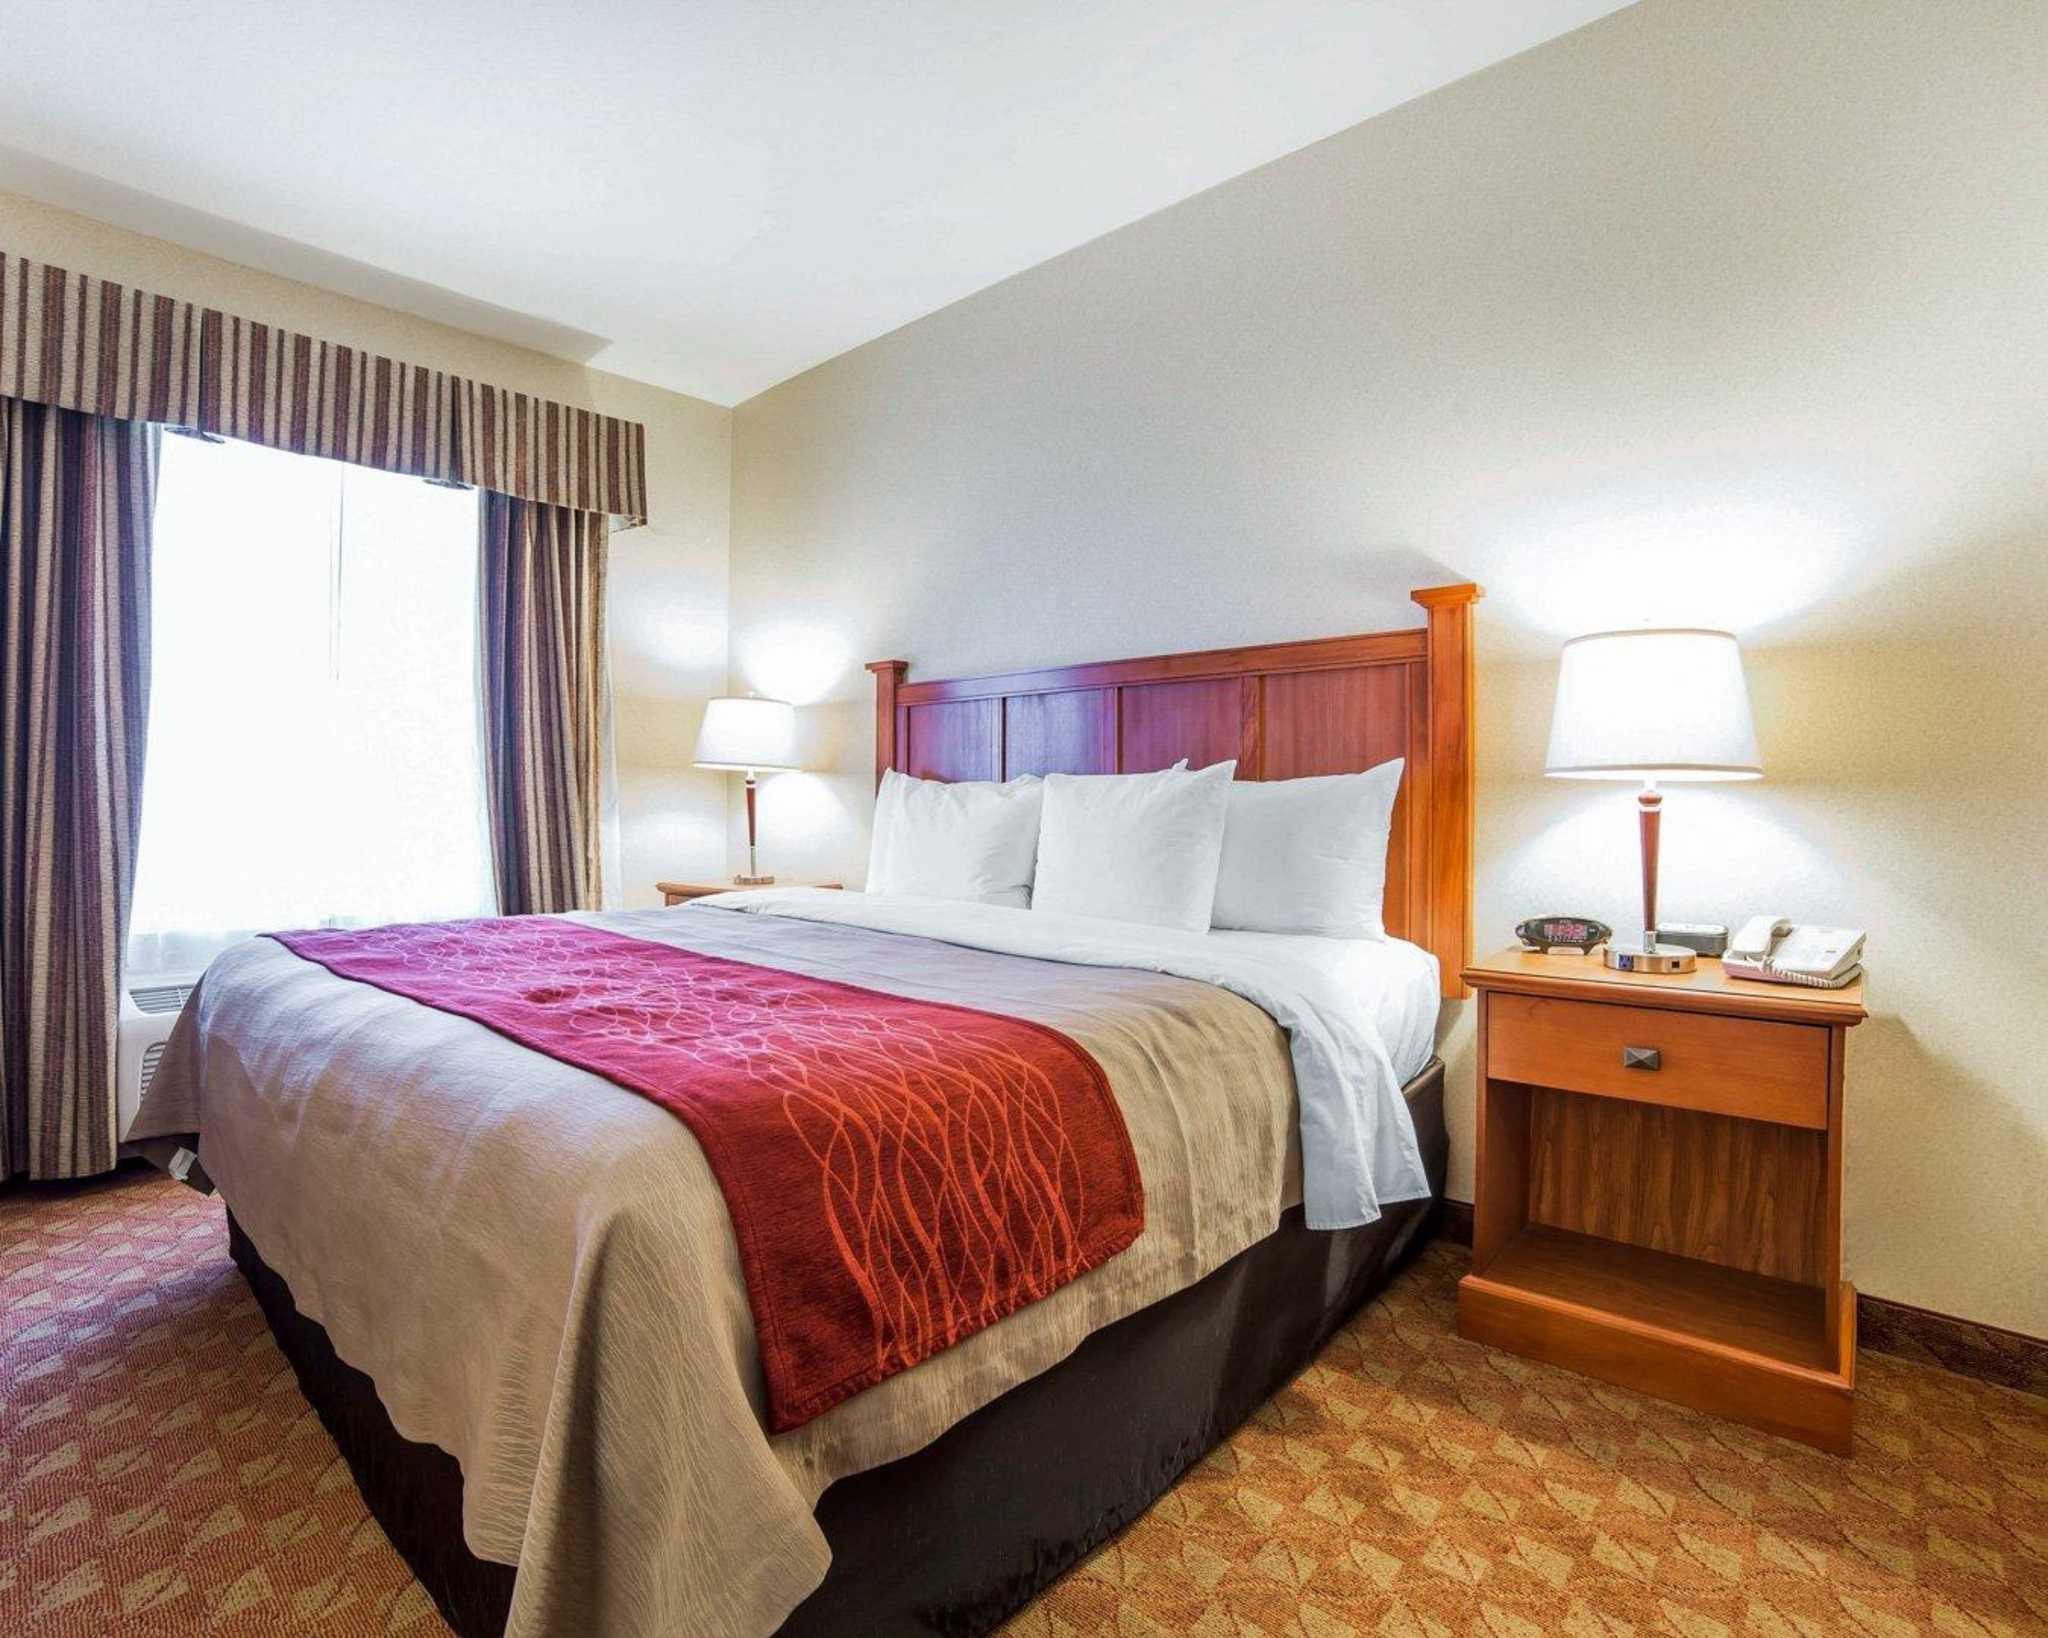 Comfort Inn & Suites Las Vegas - Nellis image 18